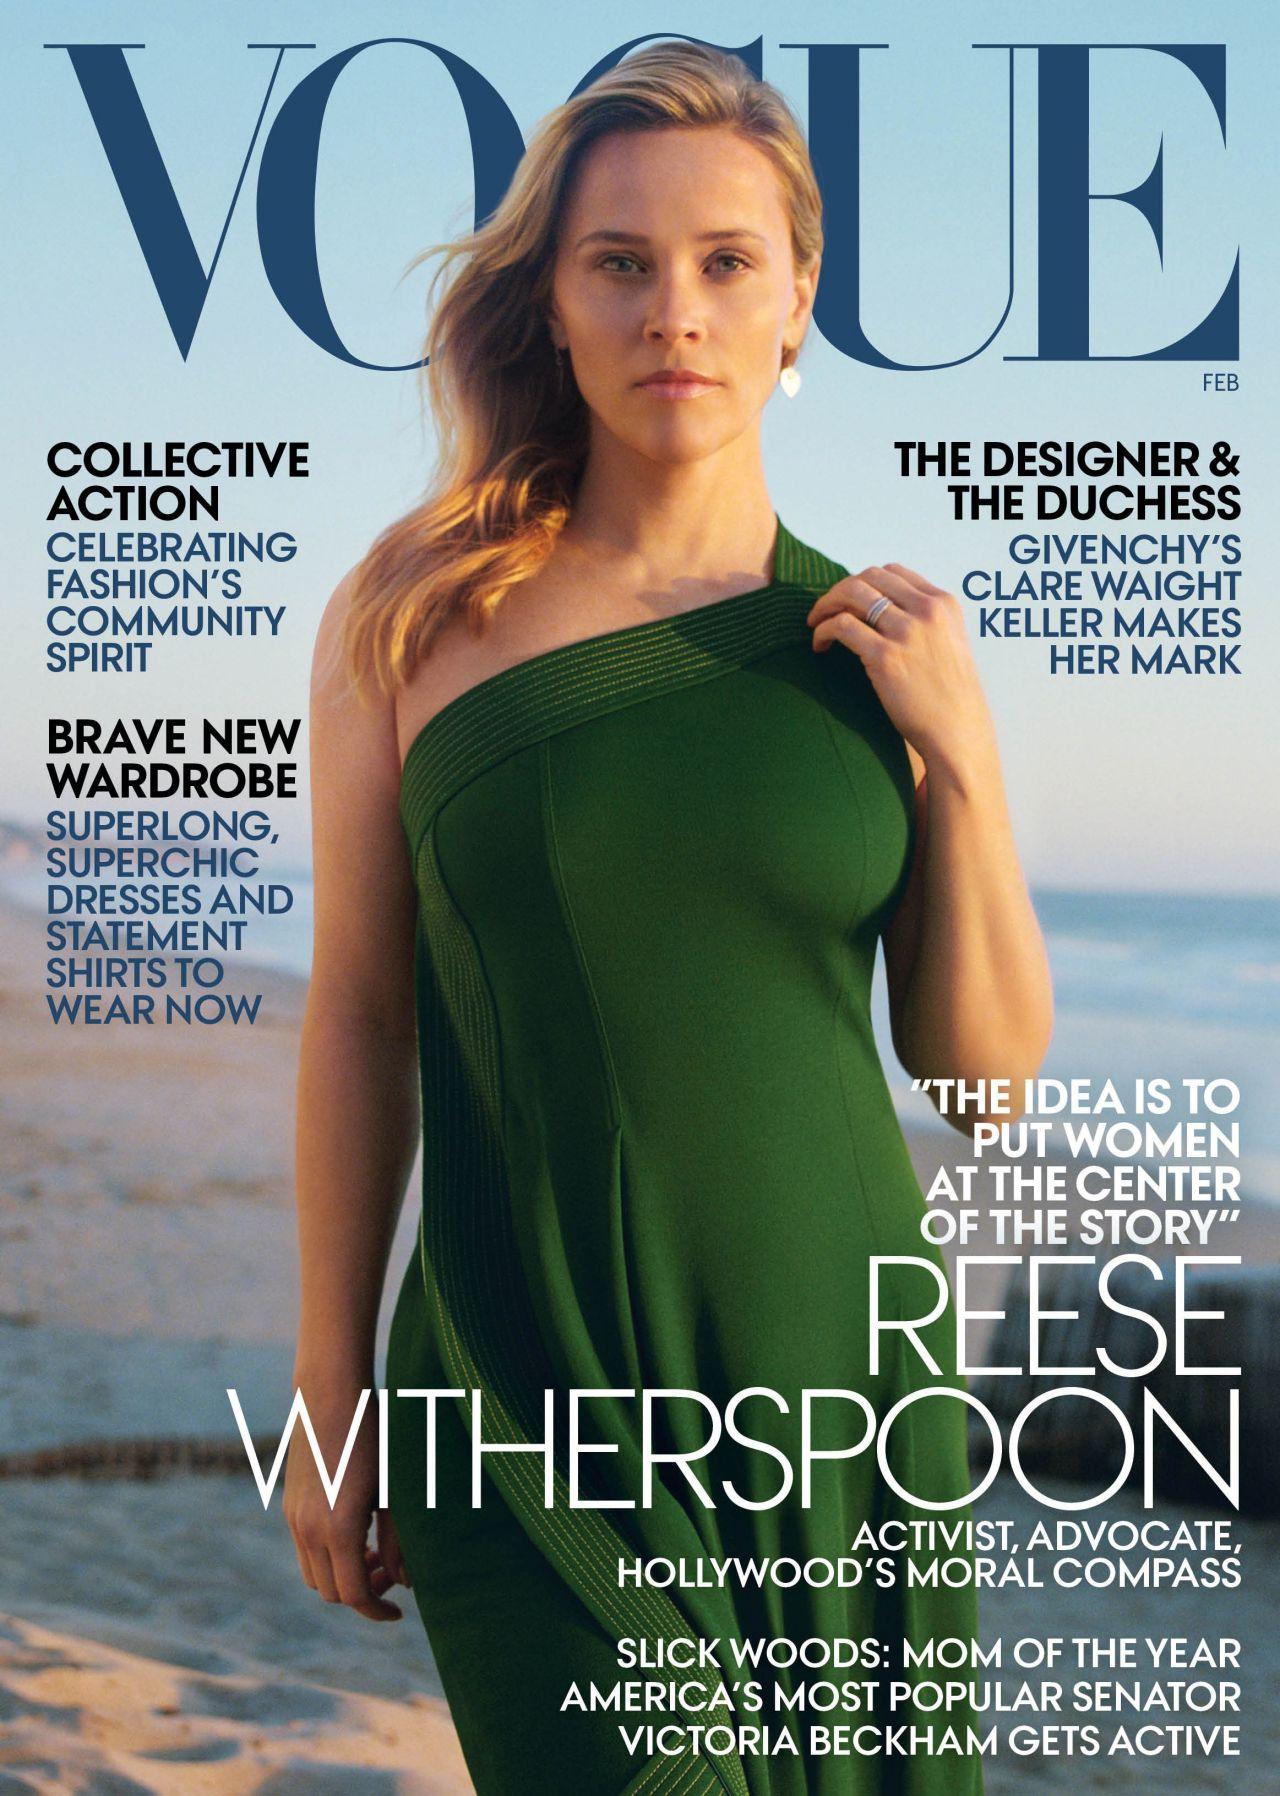 Vogue Magazine Subscription: Vogue US February 2019